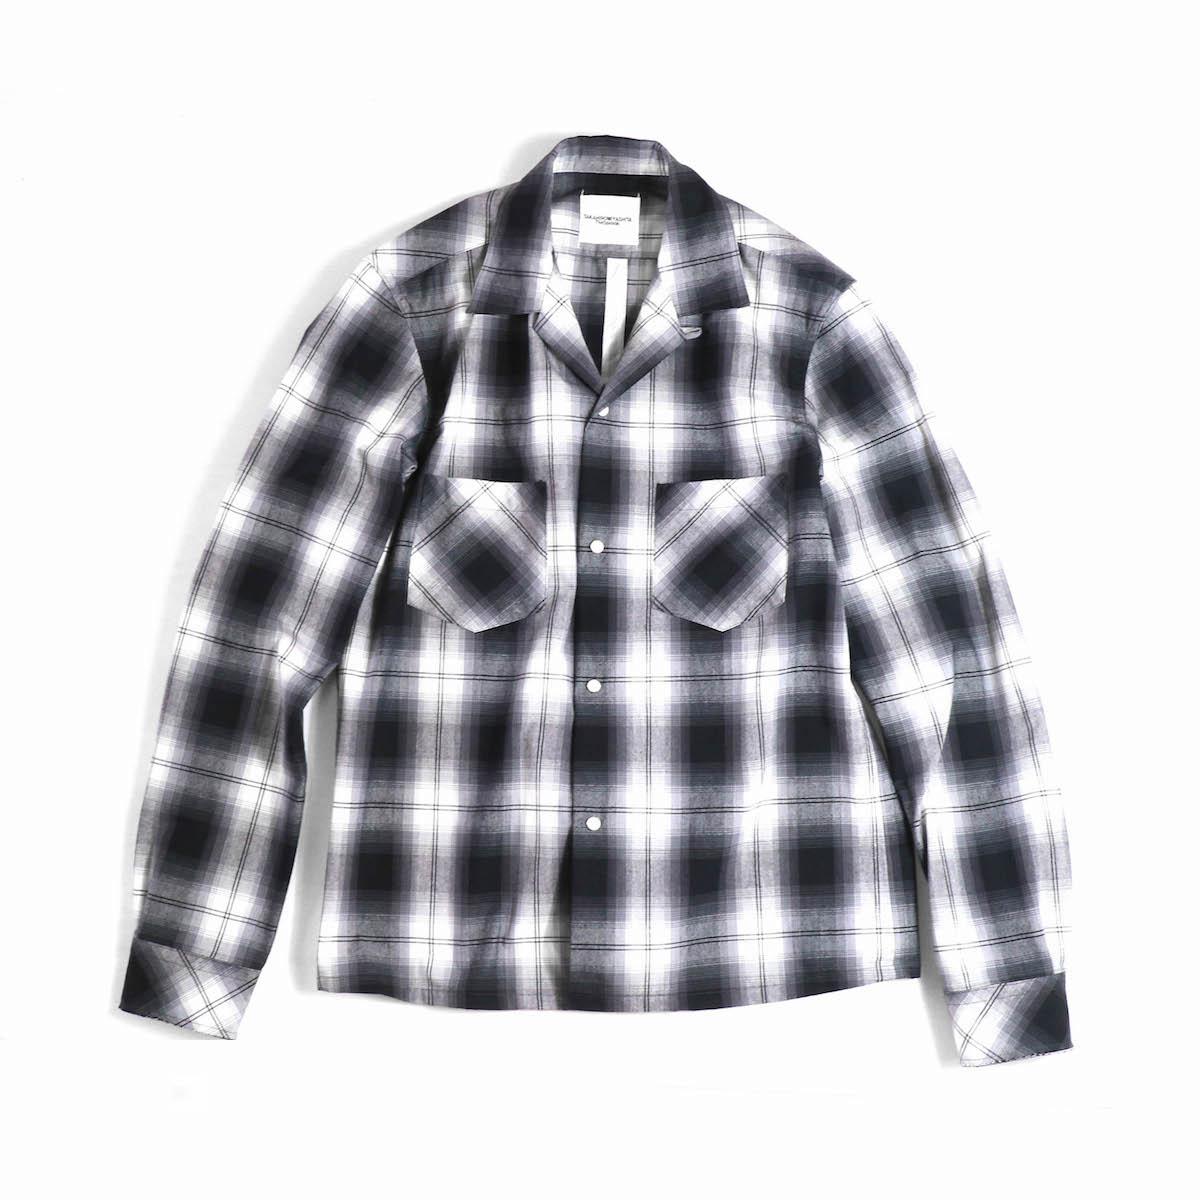 TAKAHIROMIYASHITATheSoloist. / sws.0012bSS18 work shirt. (ombre check) -black × black